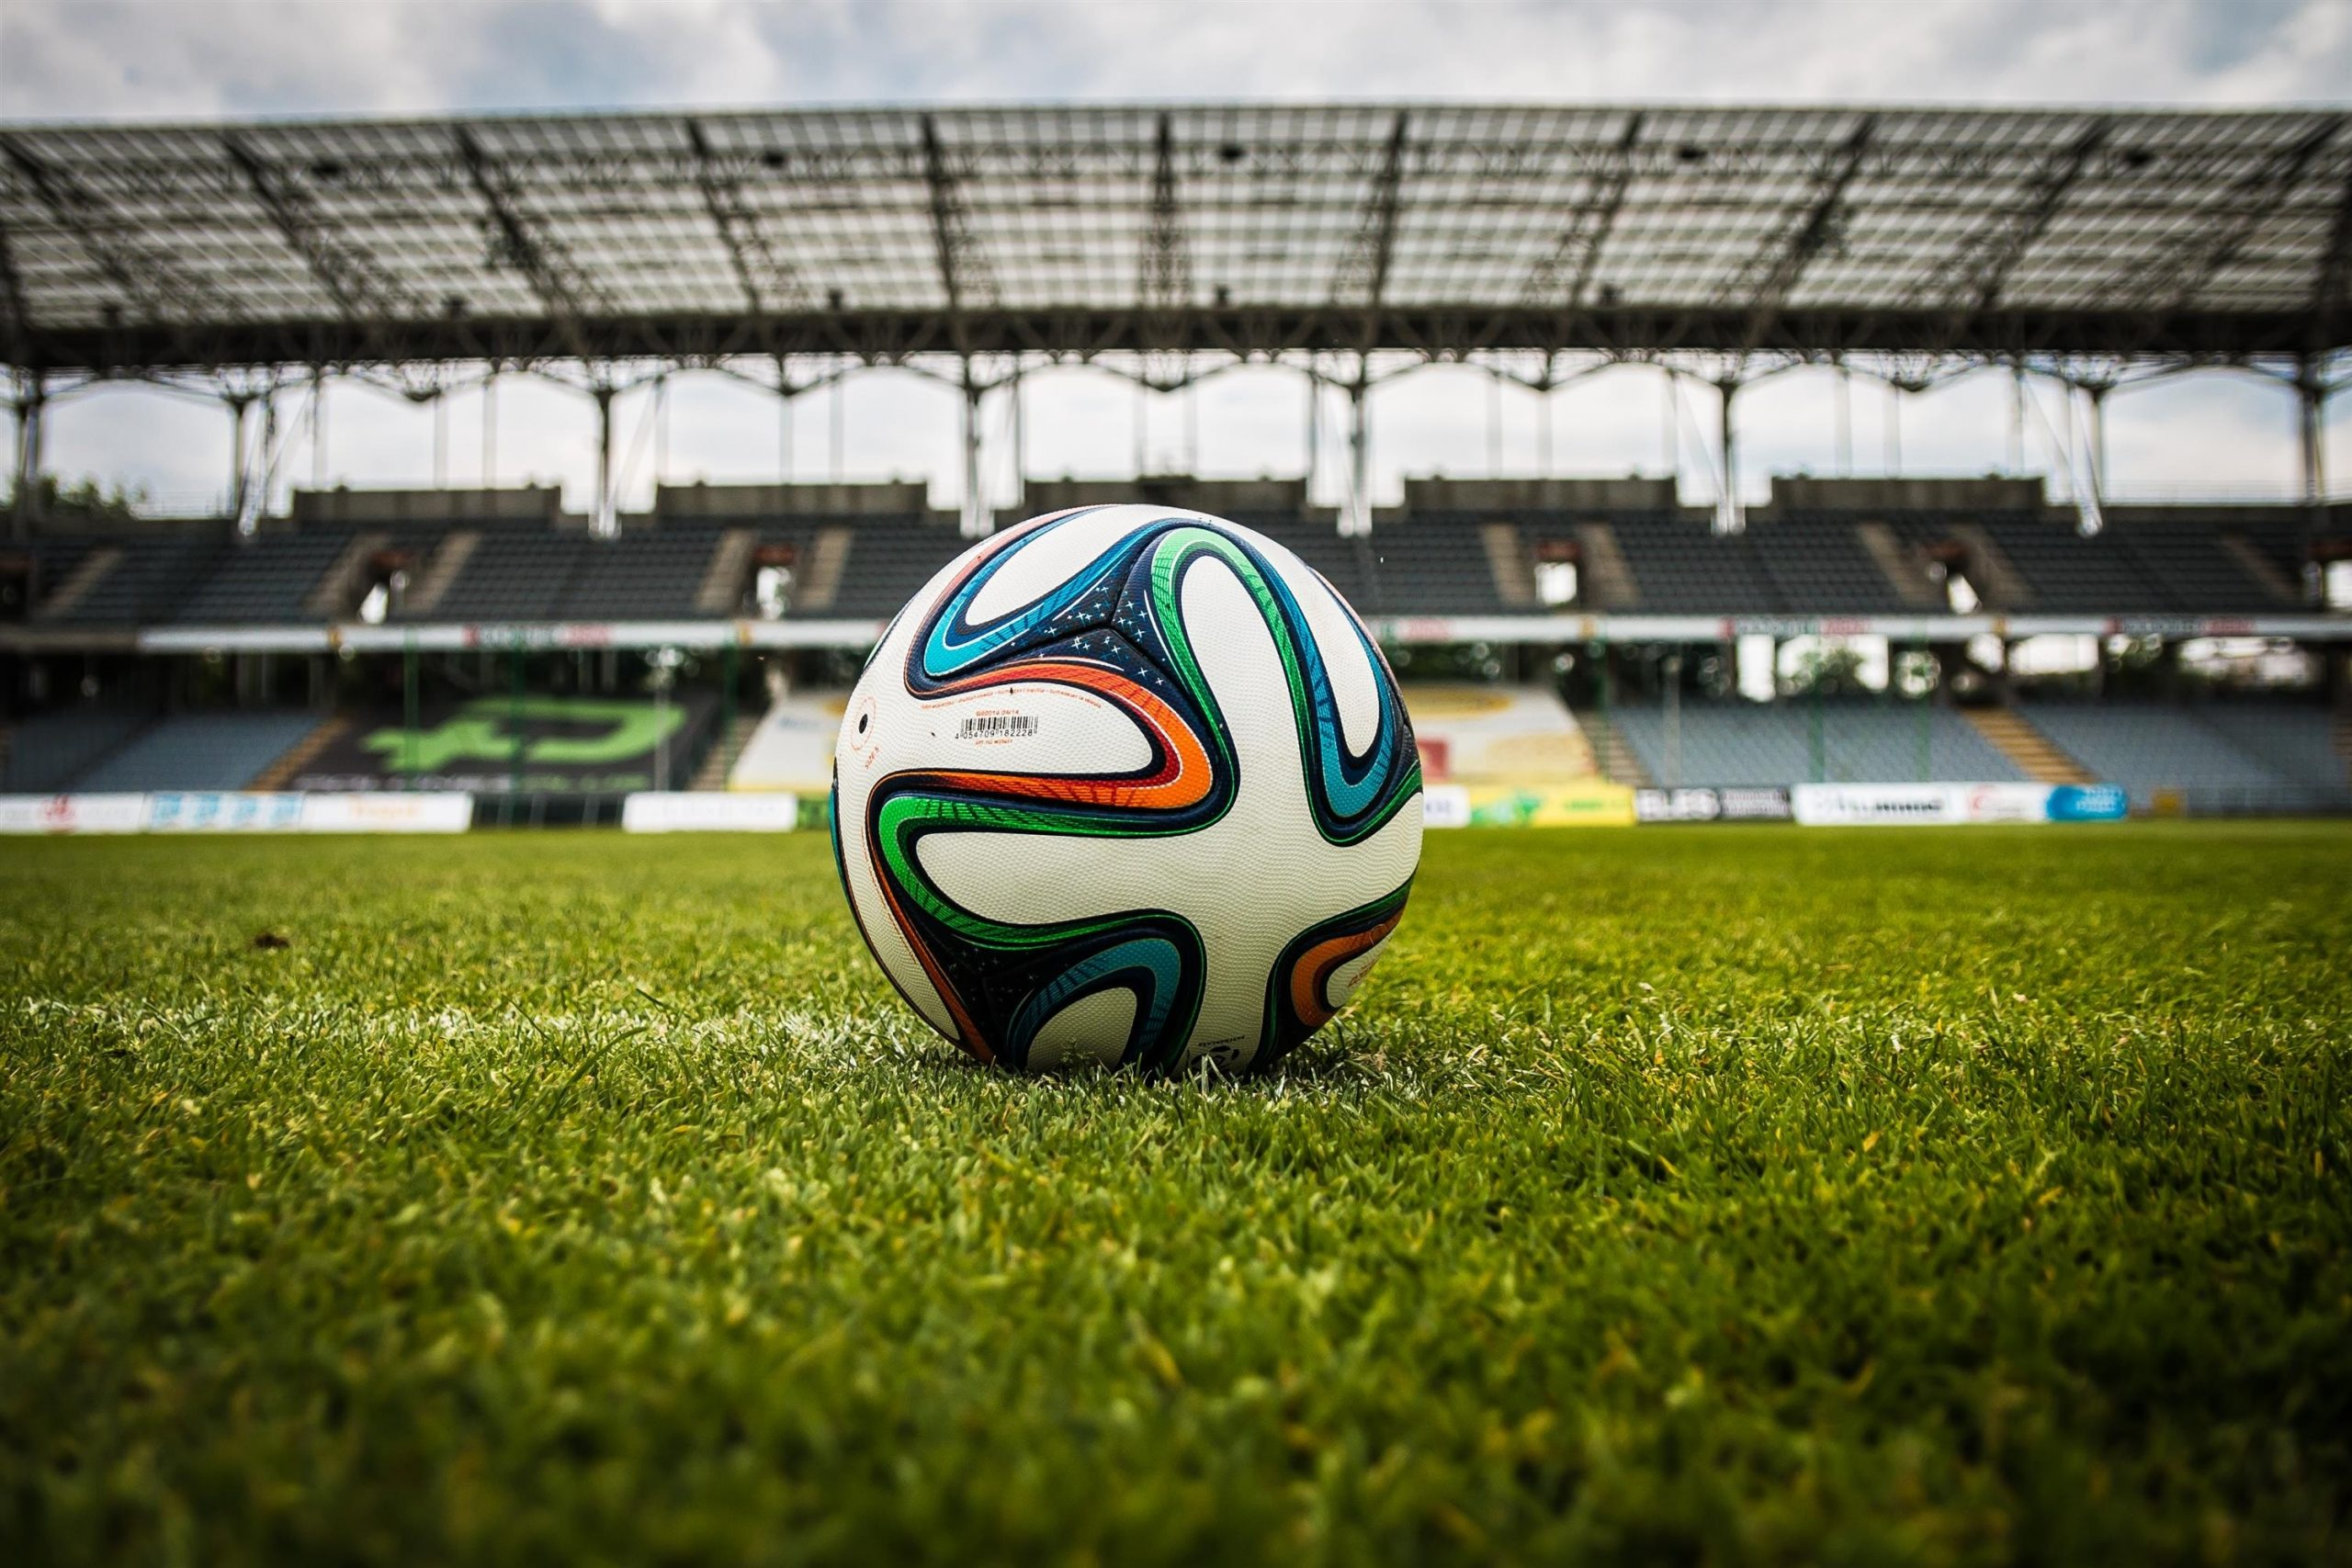 Les paris sportifs durant l'Euro de football (ANJ) image